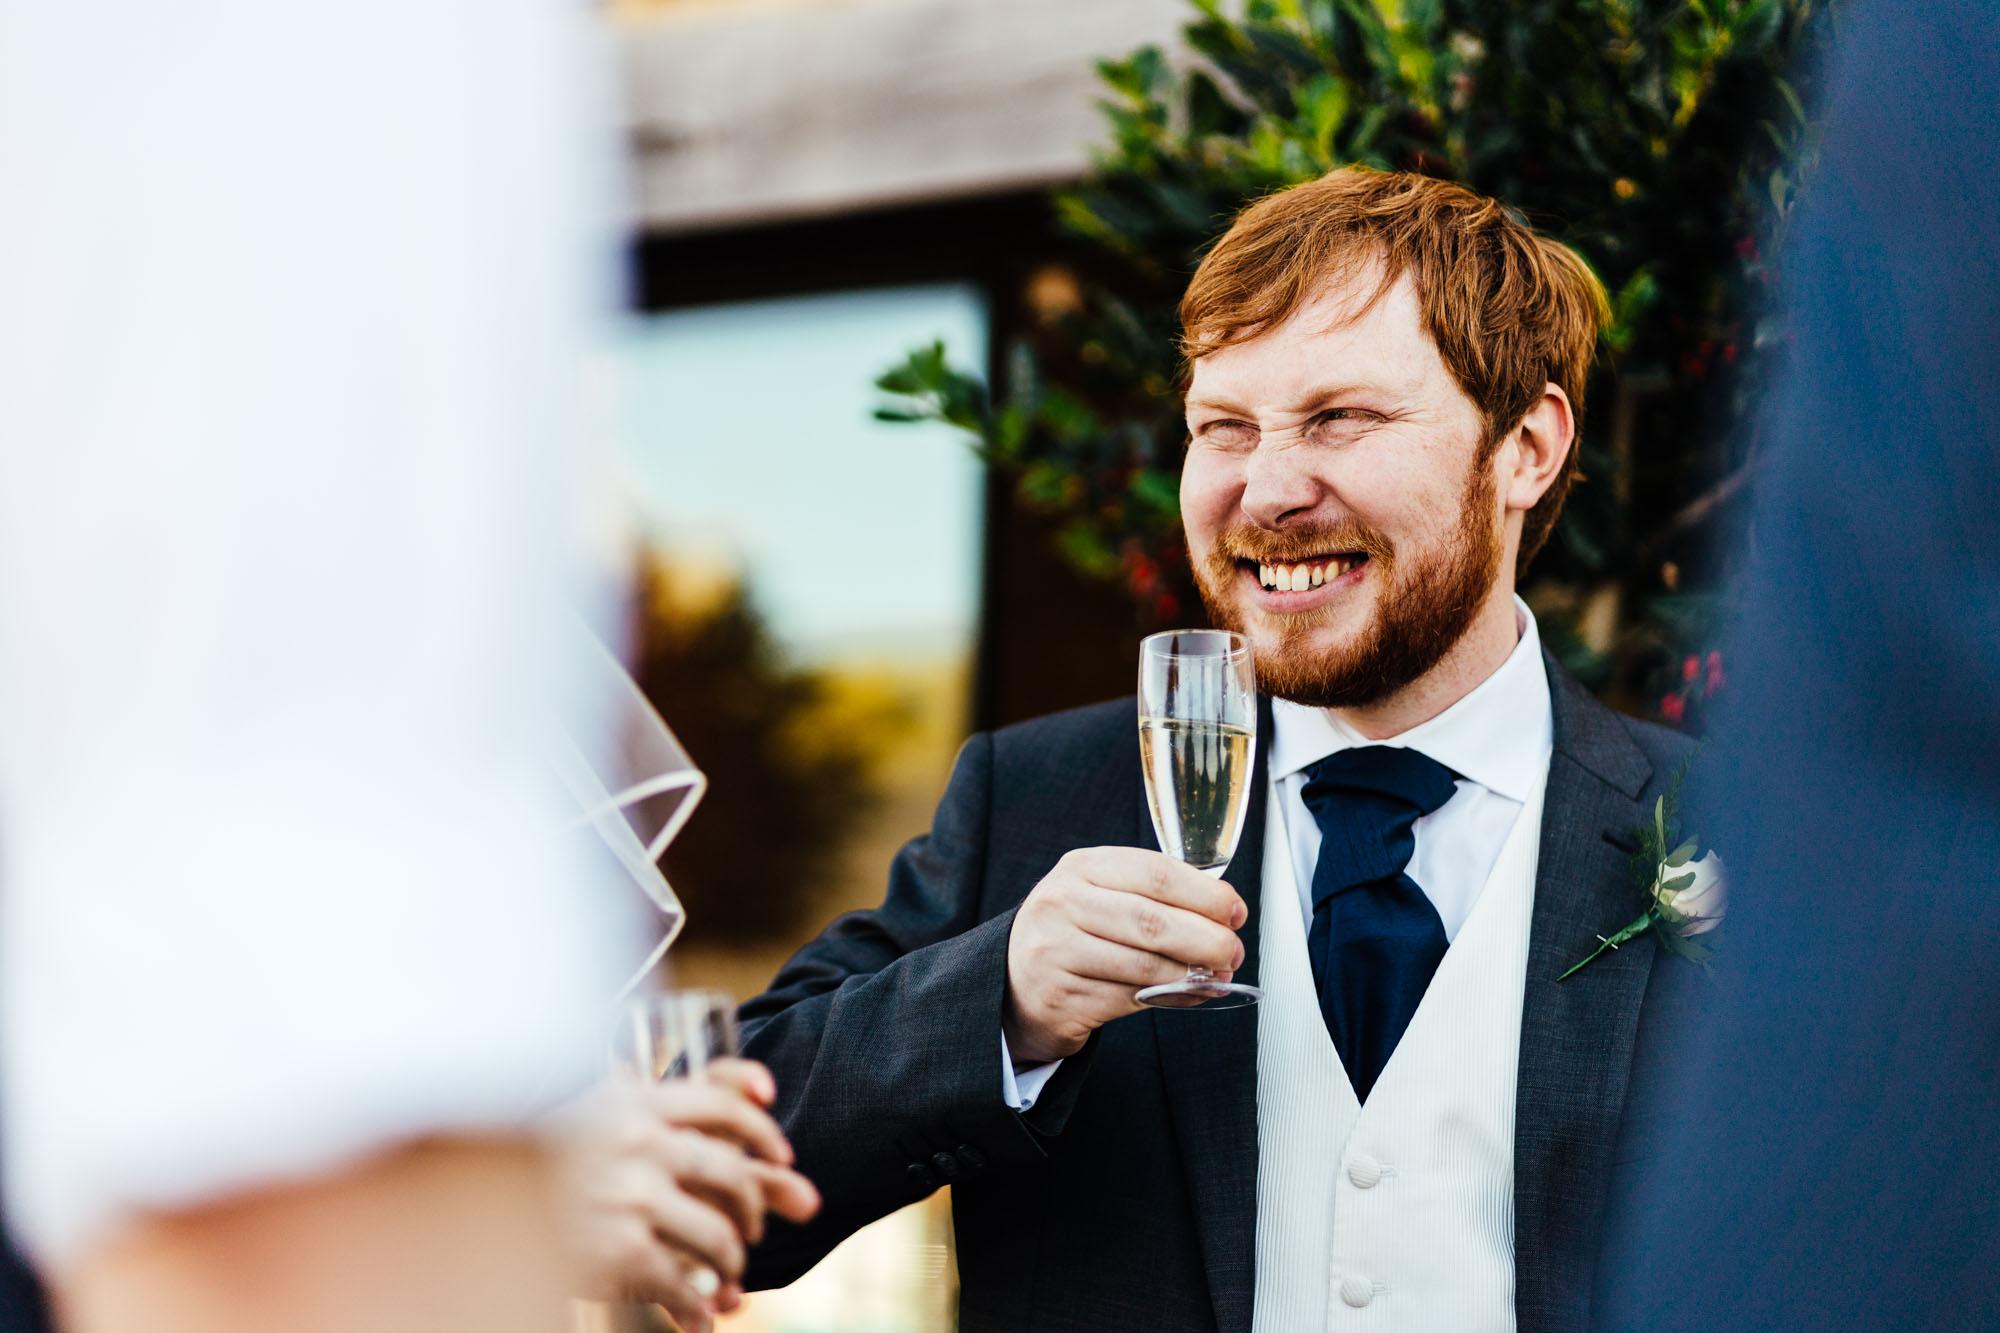 wedding-at-dodford-manor-44